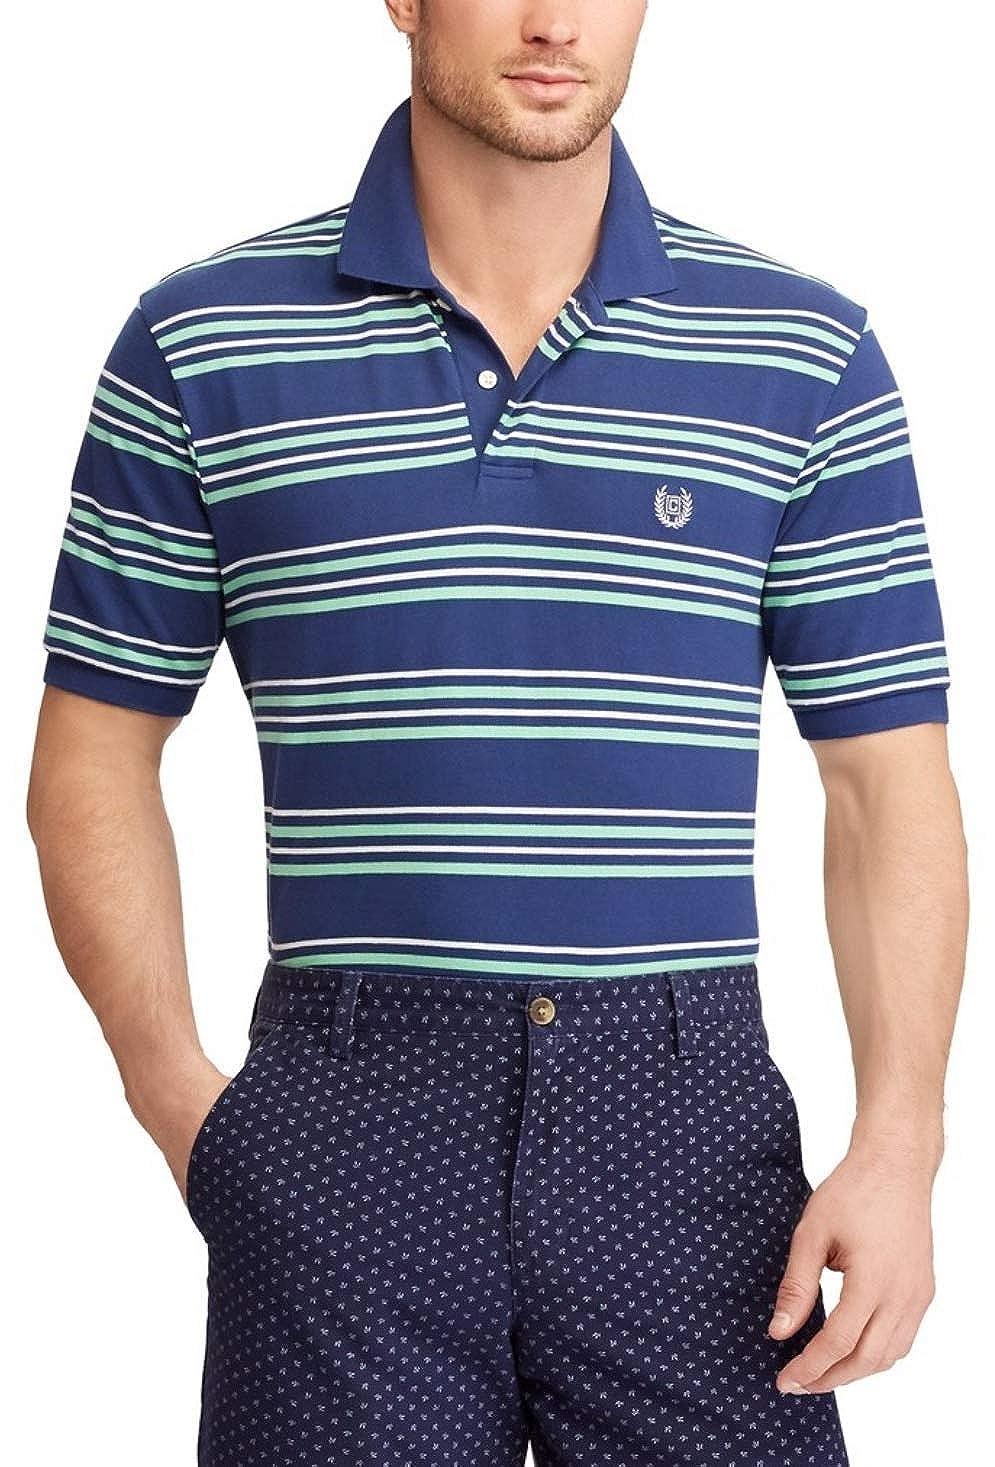 a2064cb4 Chaps Men's Classic Fit Cotton Mesh Polo Shirt at Amazon Men's Clothing  store: